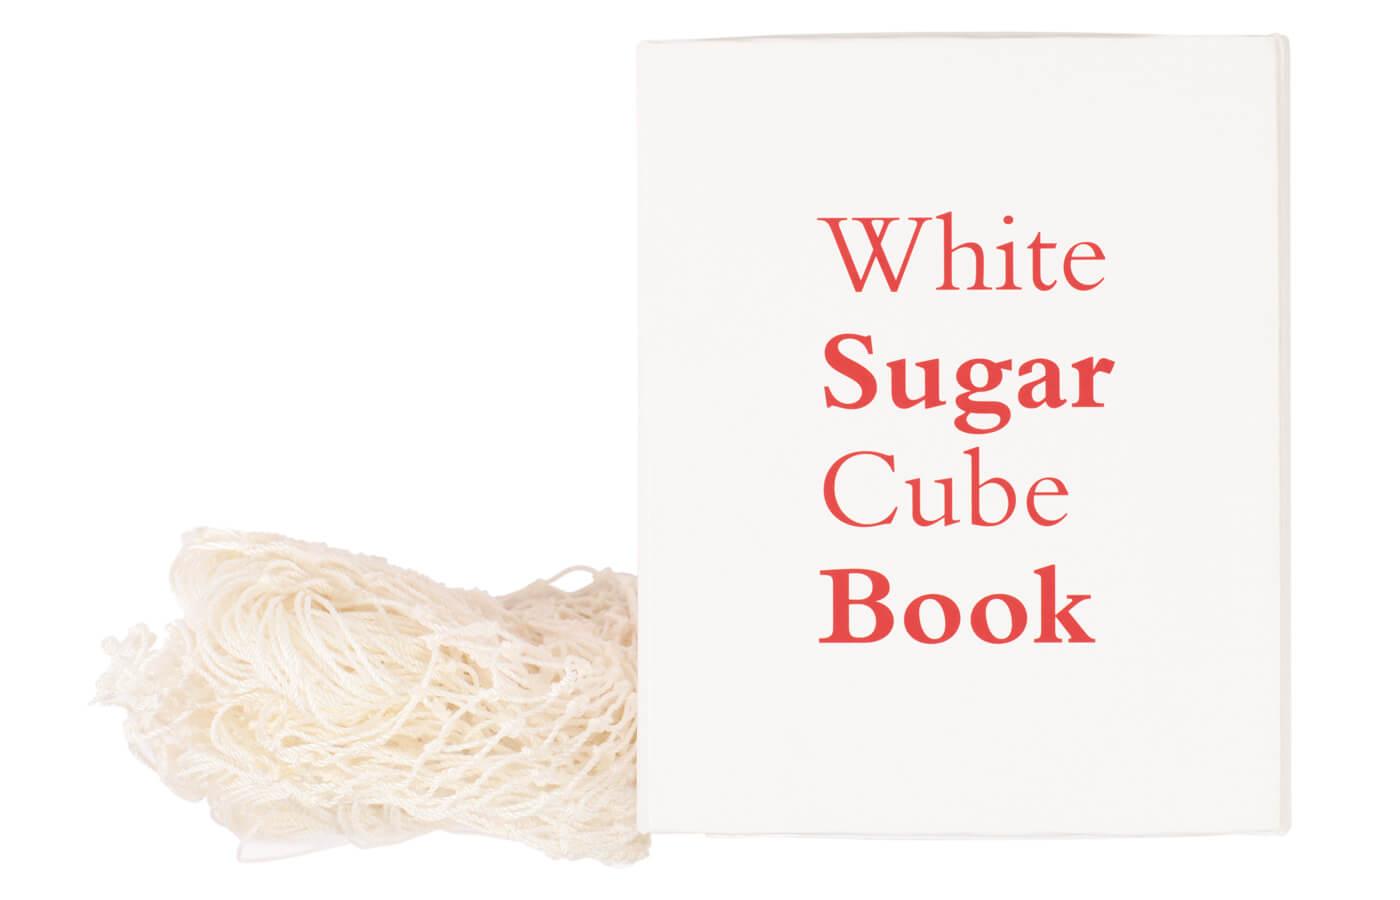 White Sugar Cube Book